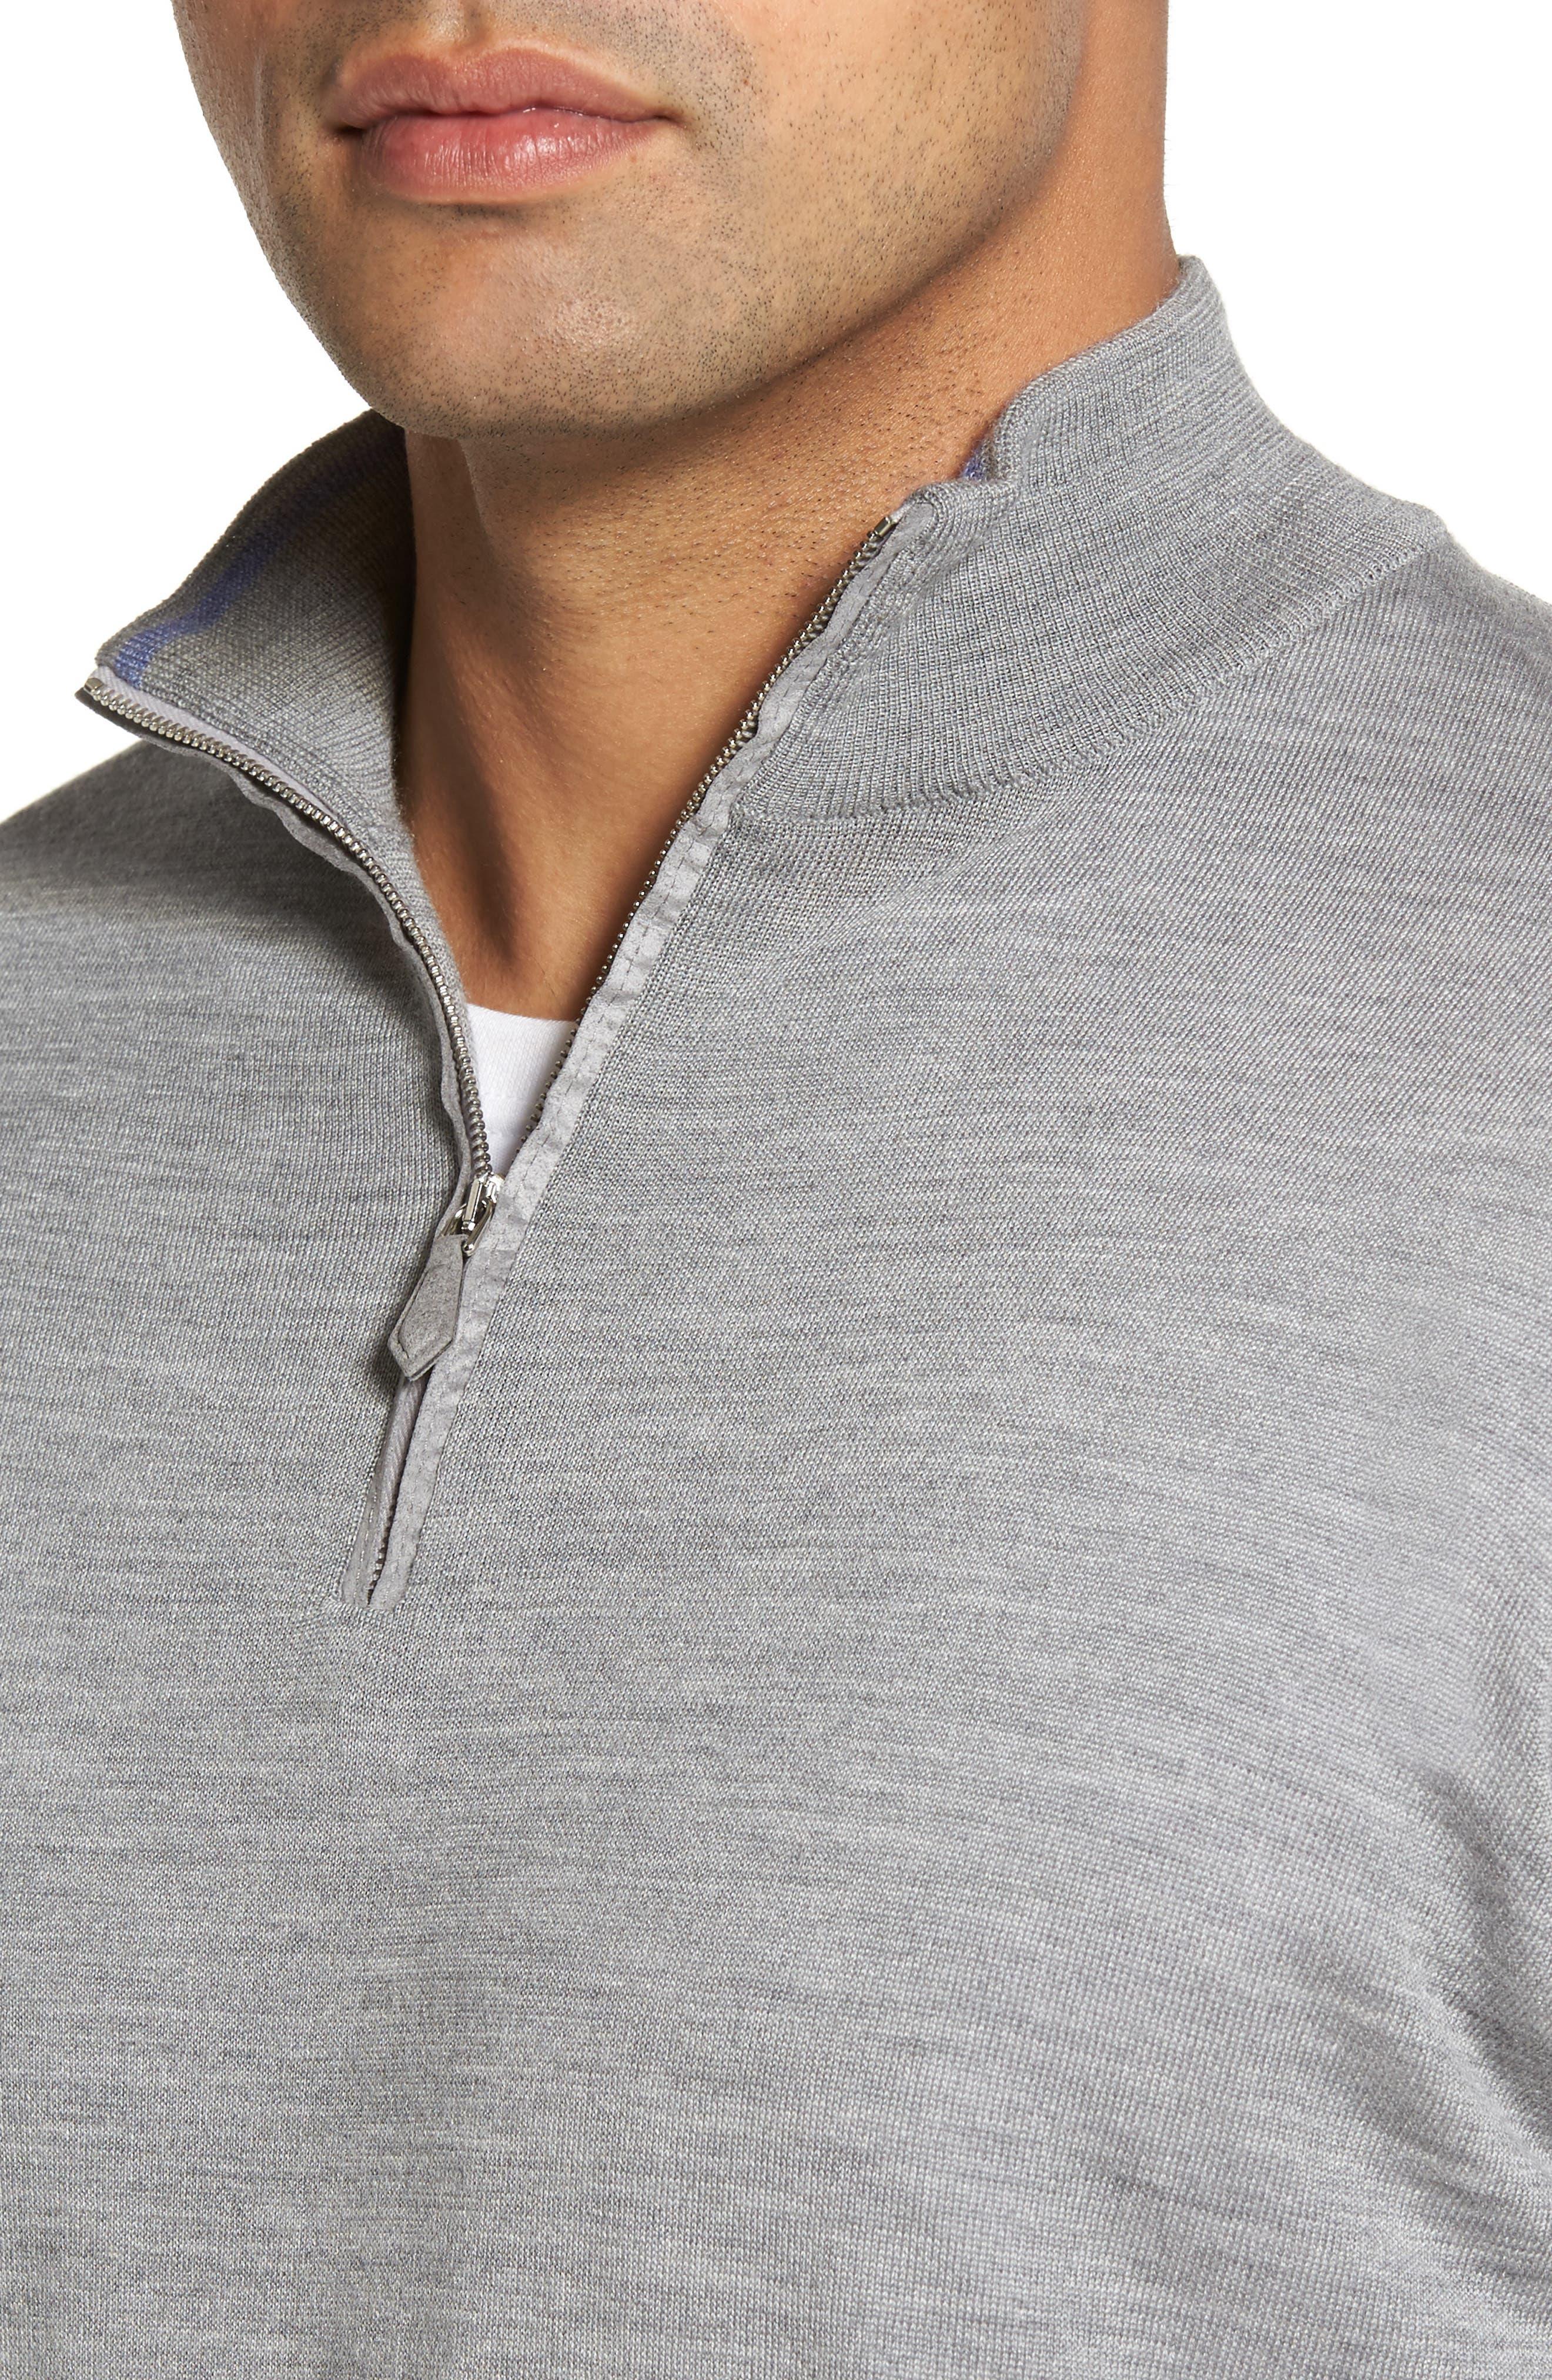 Wool Blend Quarter Zip Sweater,                             Alternate thumbnail 7, color,